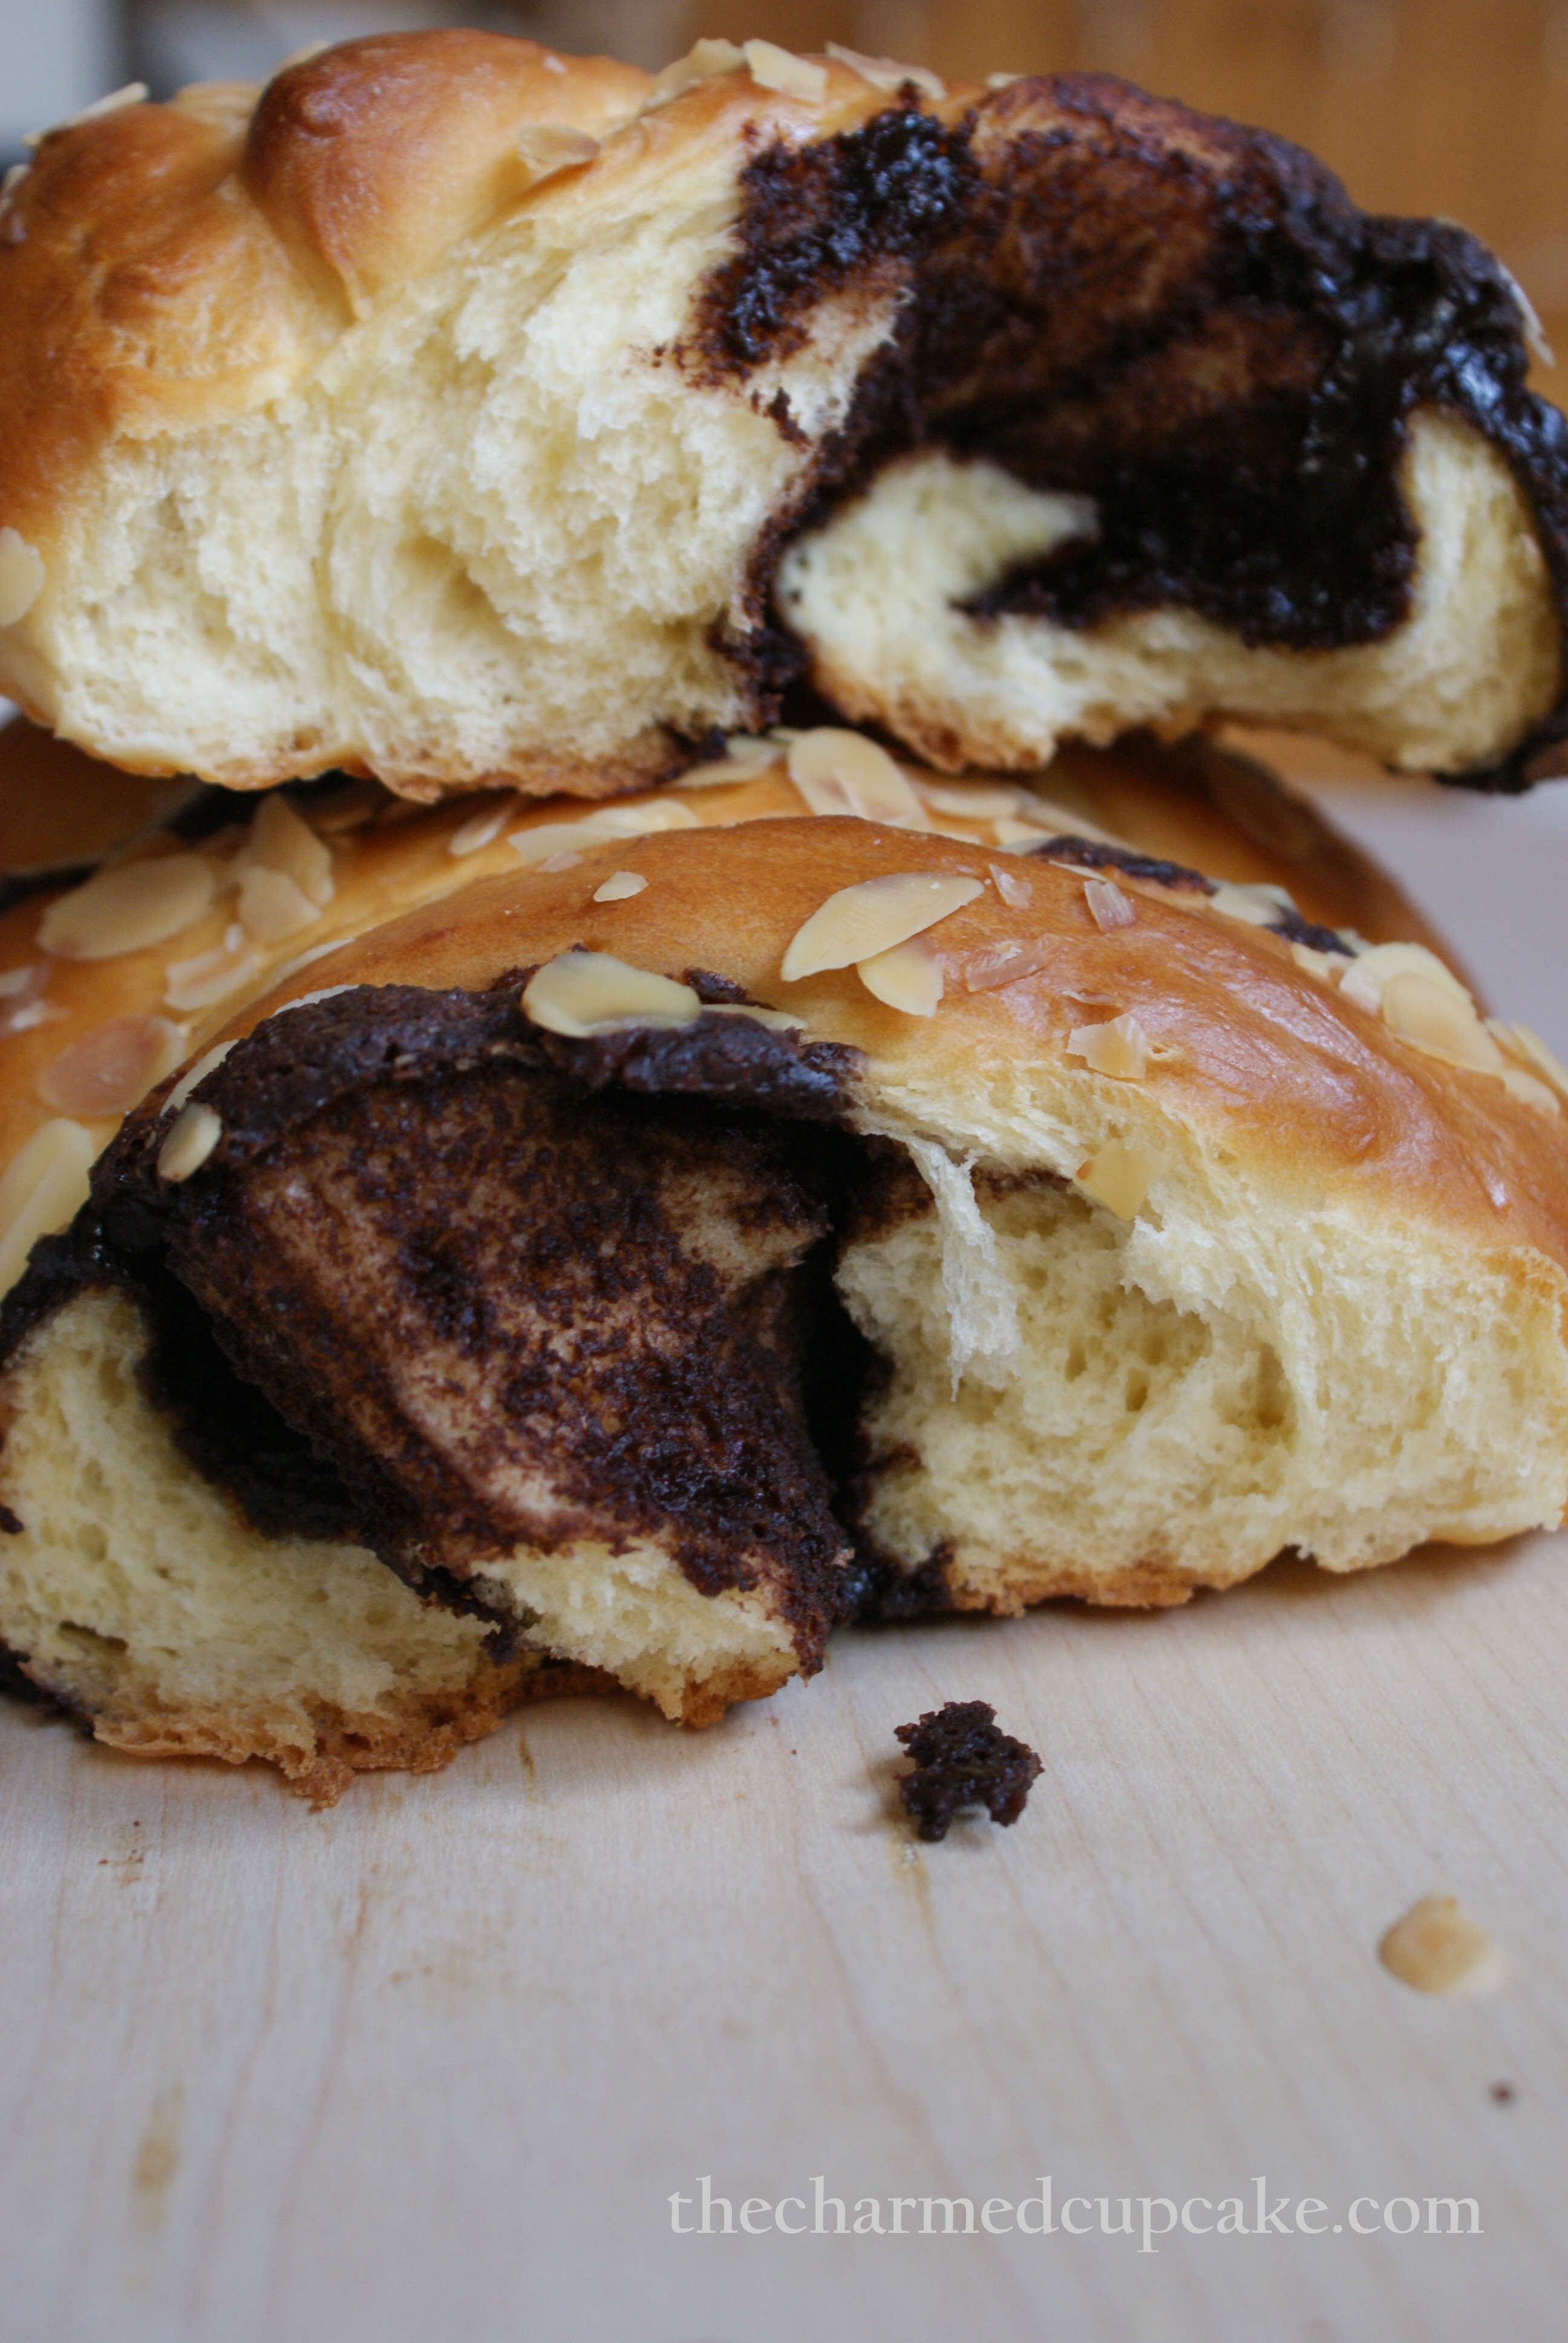 Danish Chocolate Streusel-Swirled Coffee Cake | The Charmed Cupcake